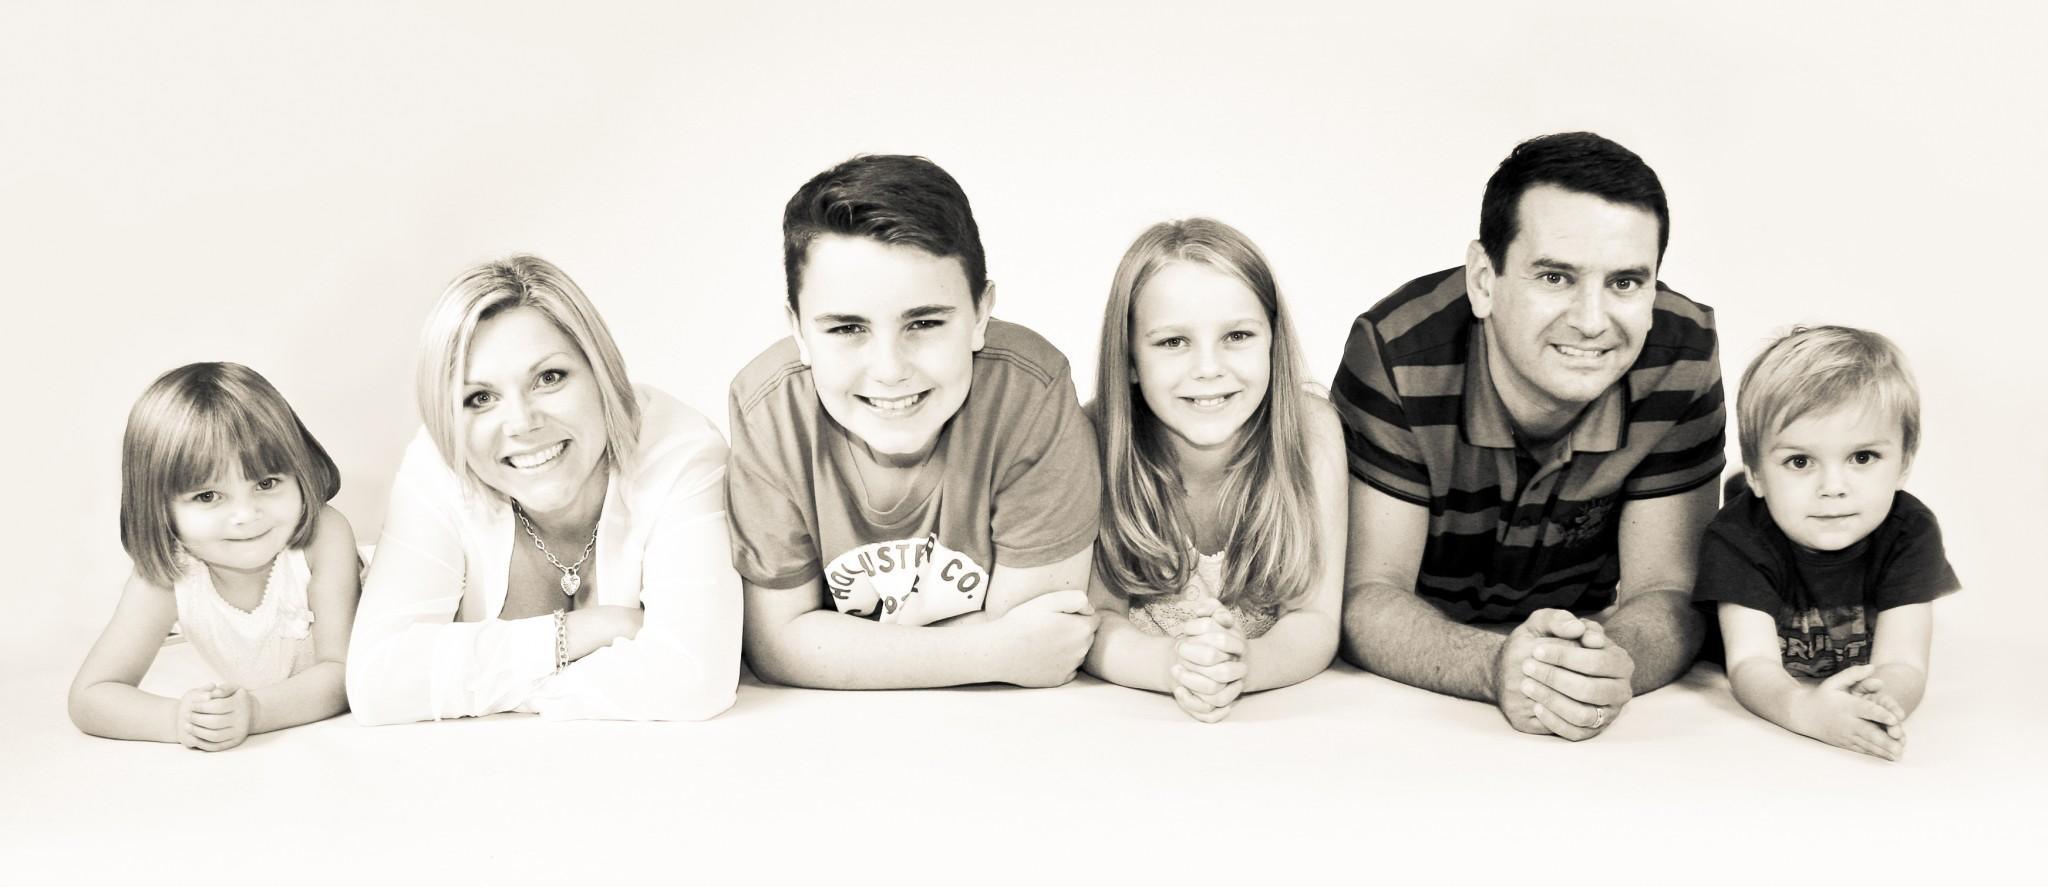 family-photography_3925longct